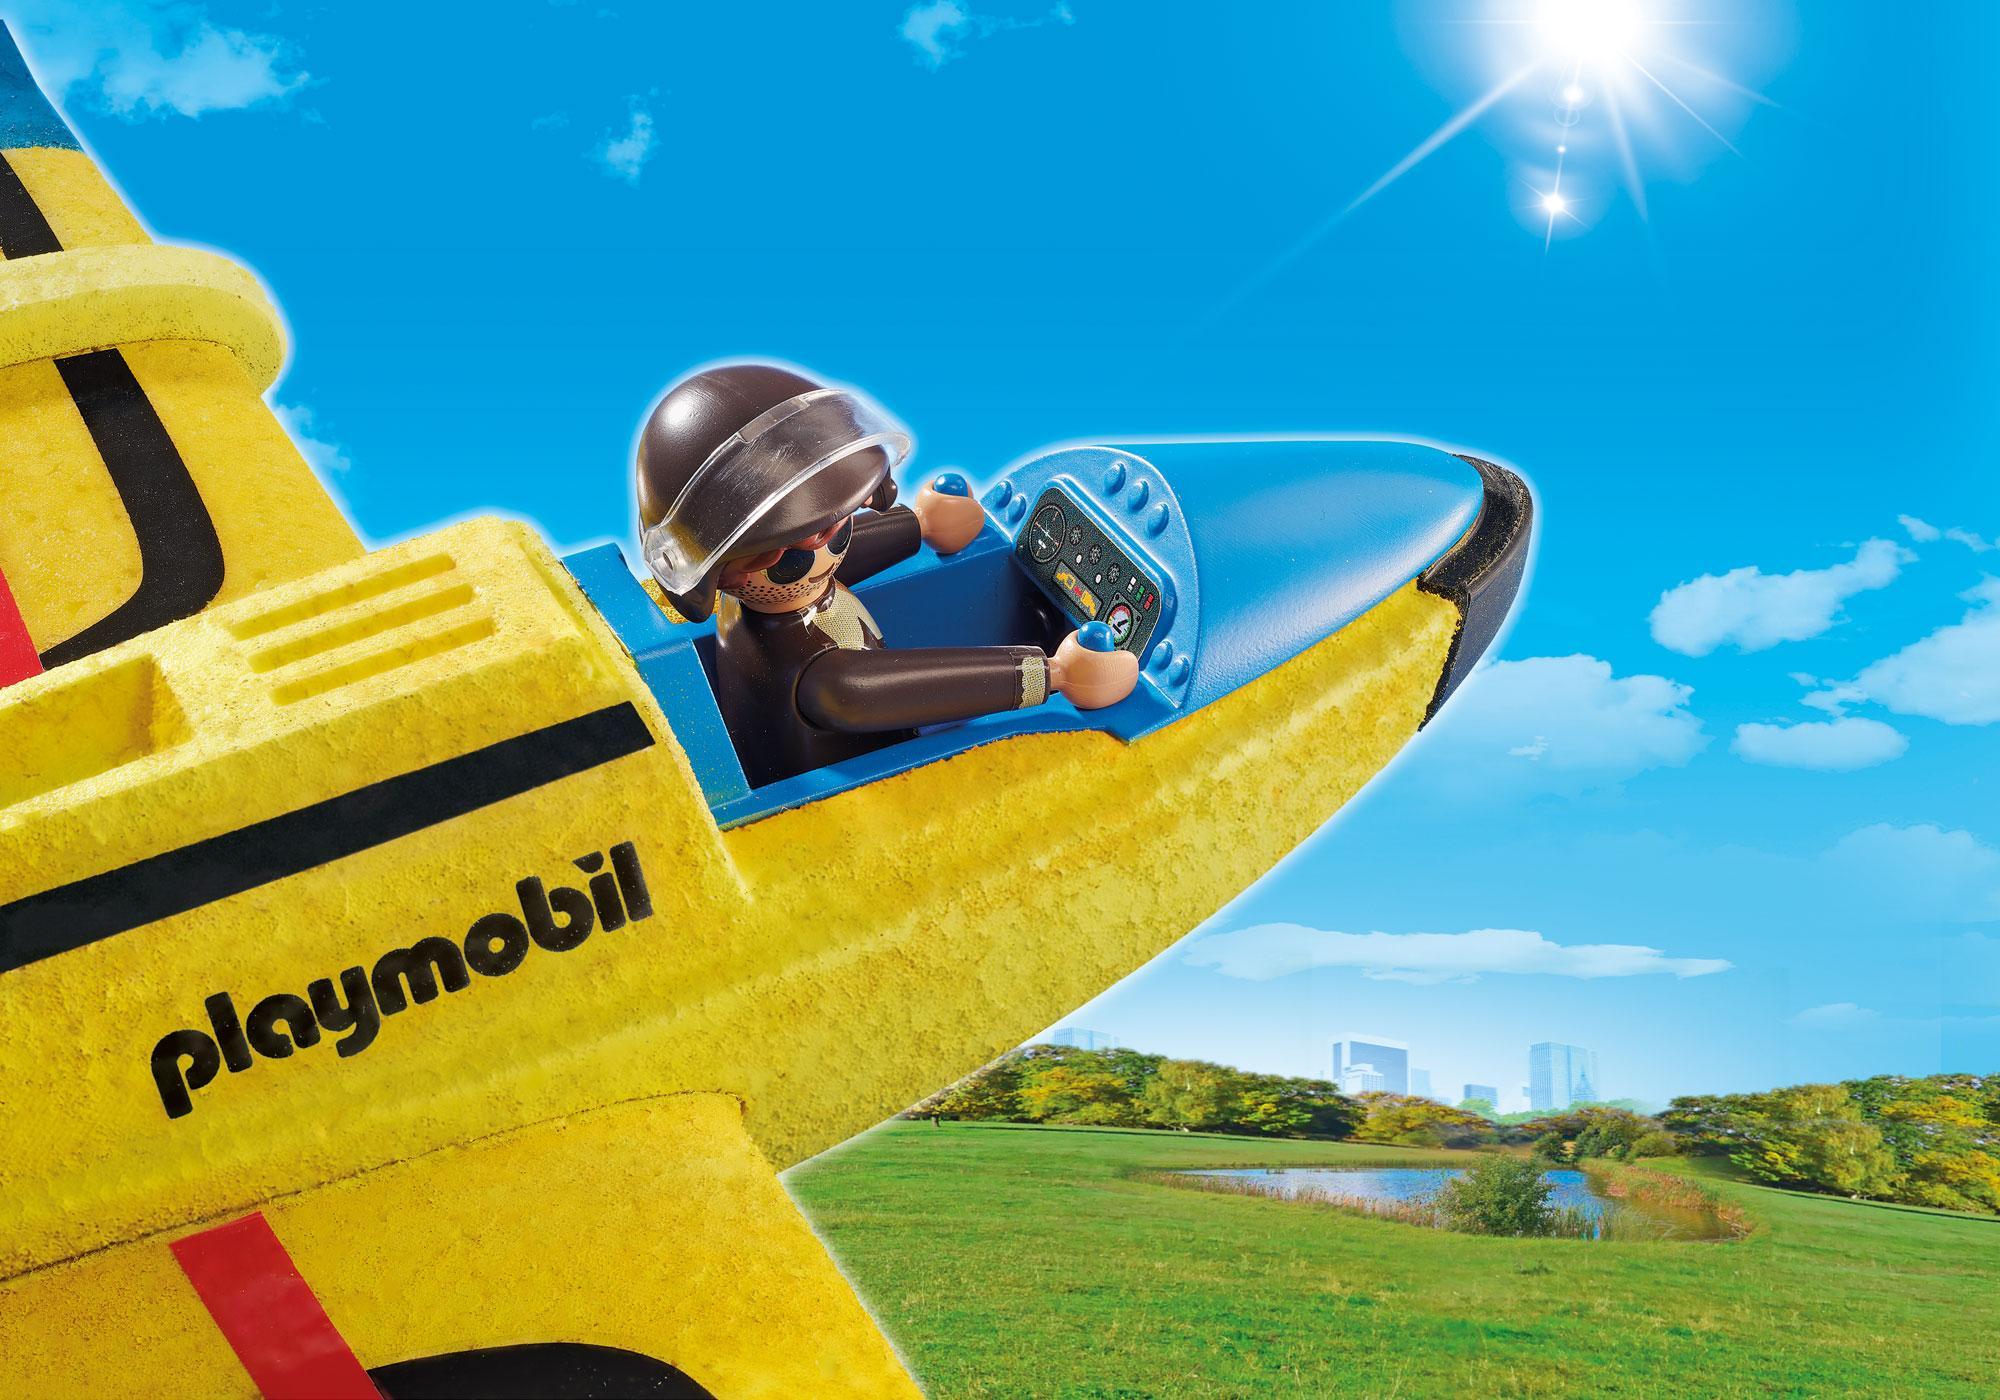 http://media.playmobil.com/i/playmobil/70057_product_extra2/Kast-og-glid vandfly